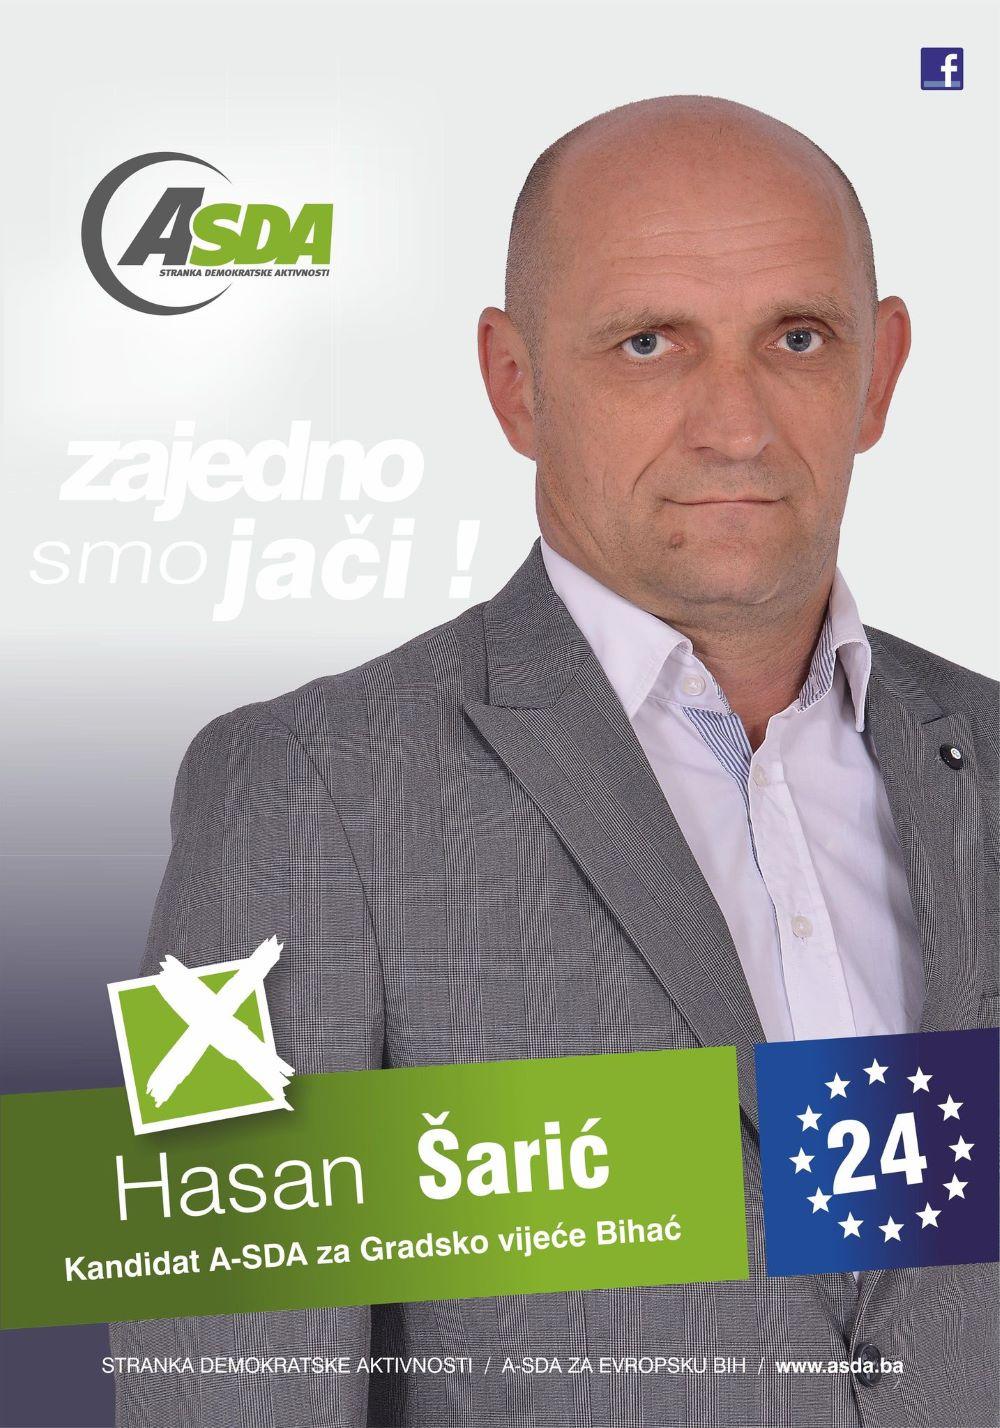 Hasan Šarić